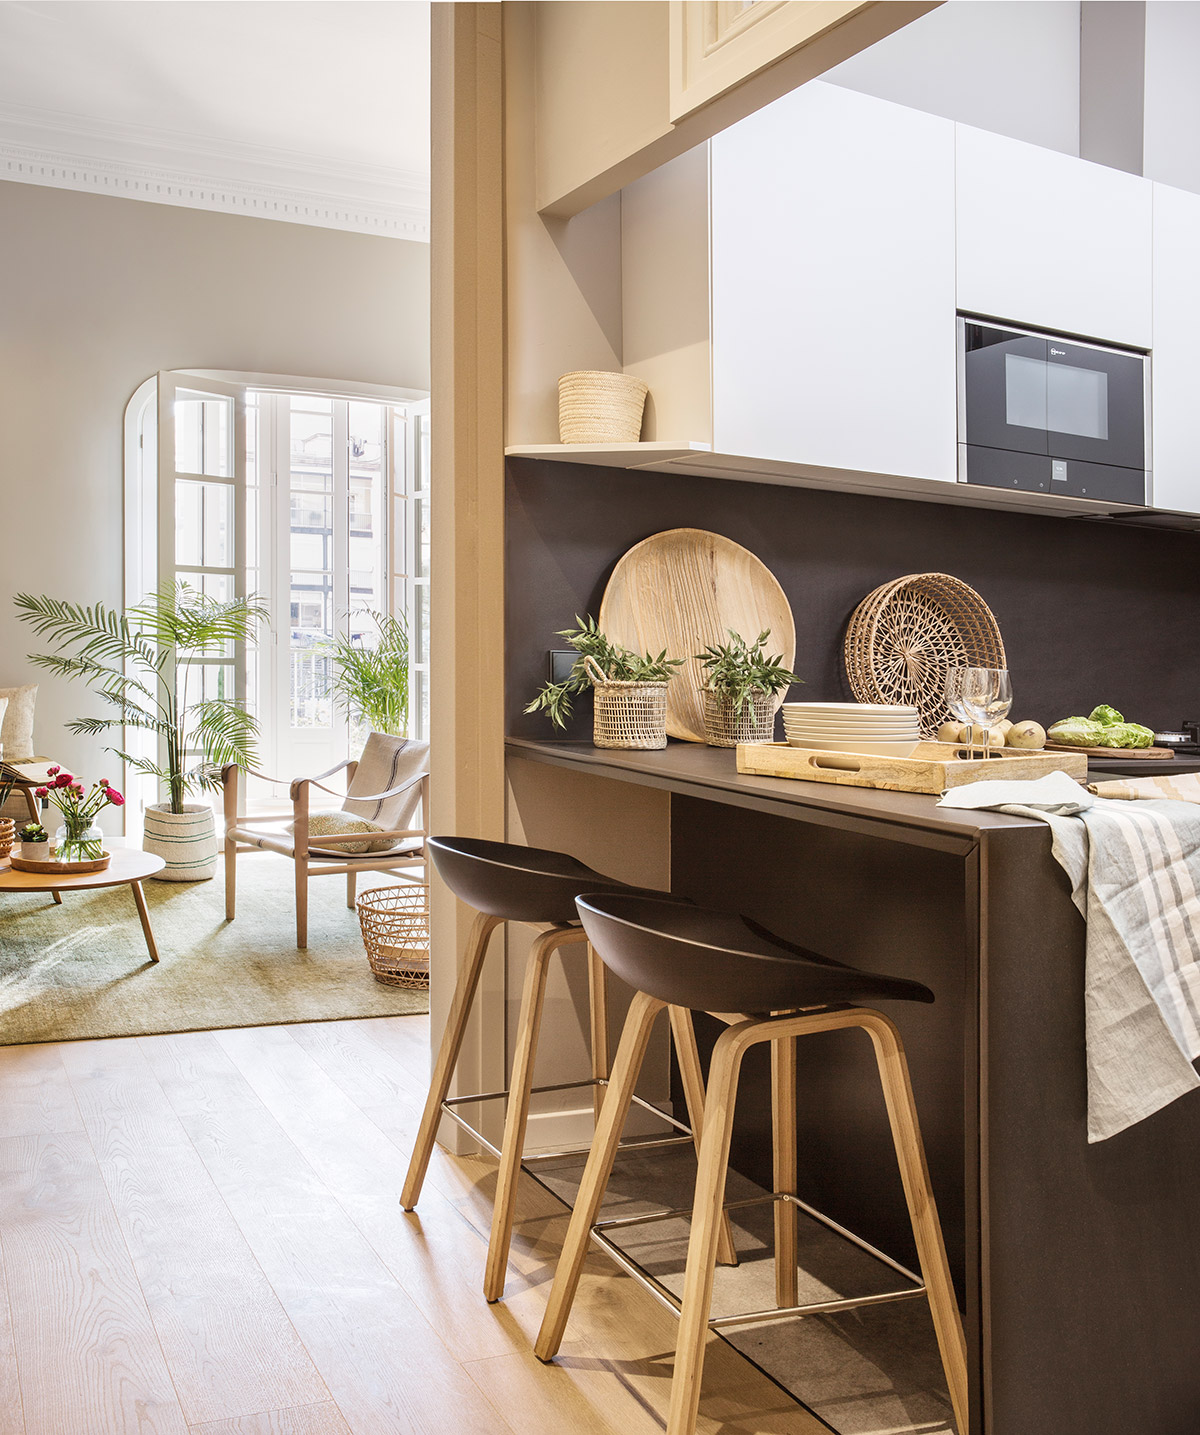 Dise o de una cocina con barra de desayuno for Modelo de cocina con barra